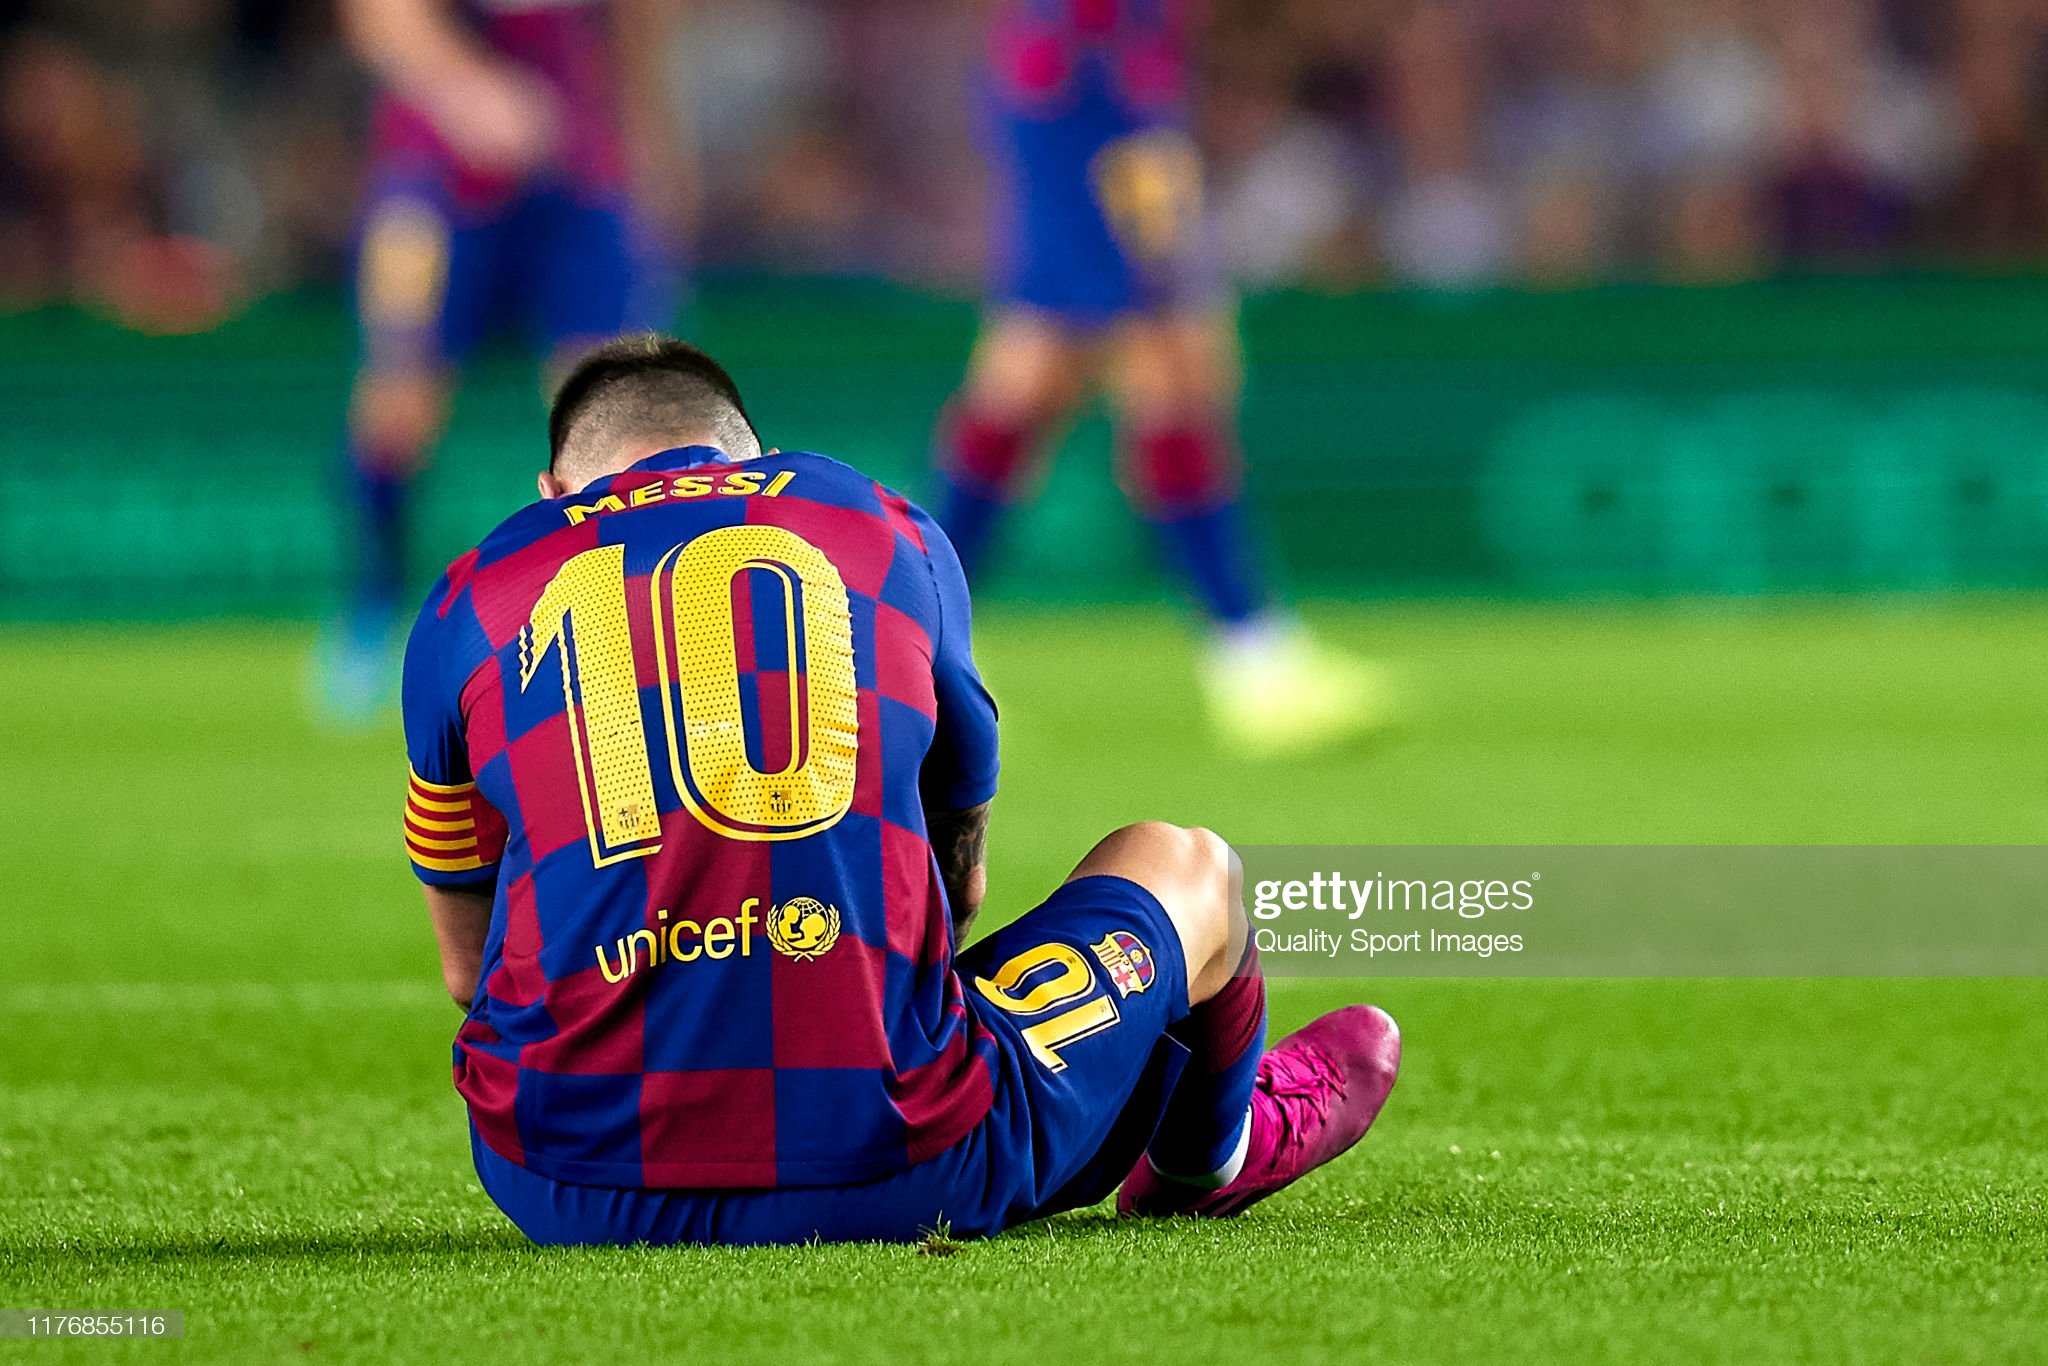 صور مباراة : برشلونة - فياريال 2-1 ( 24-09-2019 )  Lionel-messi-of-fc-barcelona-injured-over-the-pitch-during-the-liga-picture-id1176855116?s=2048x2048